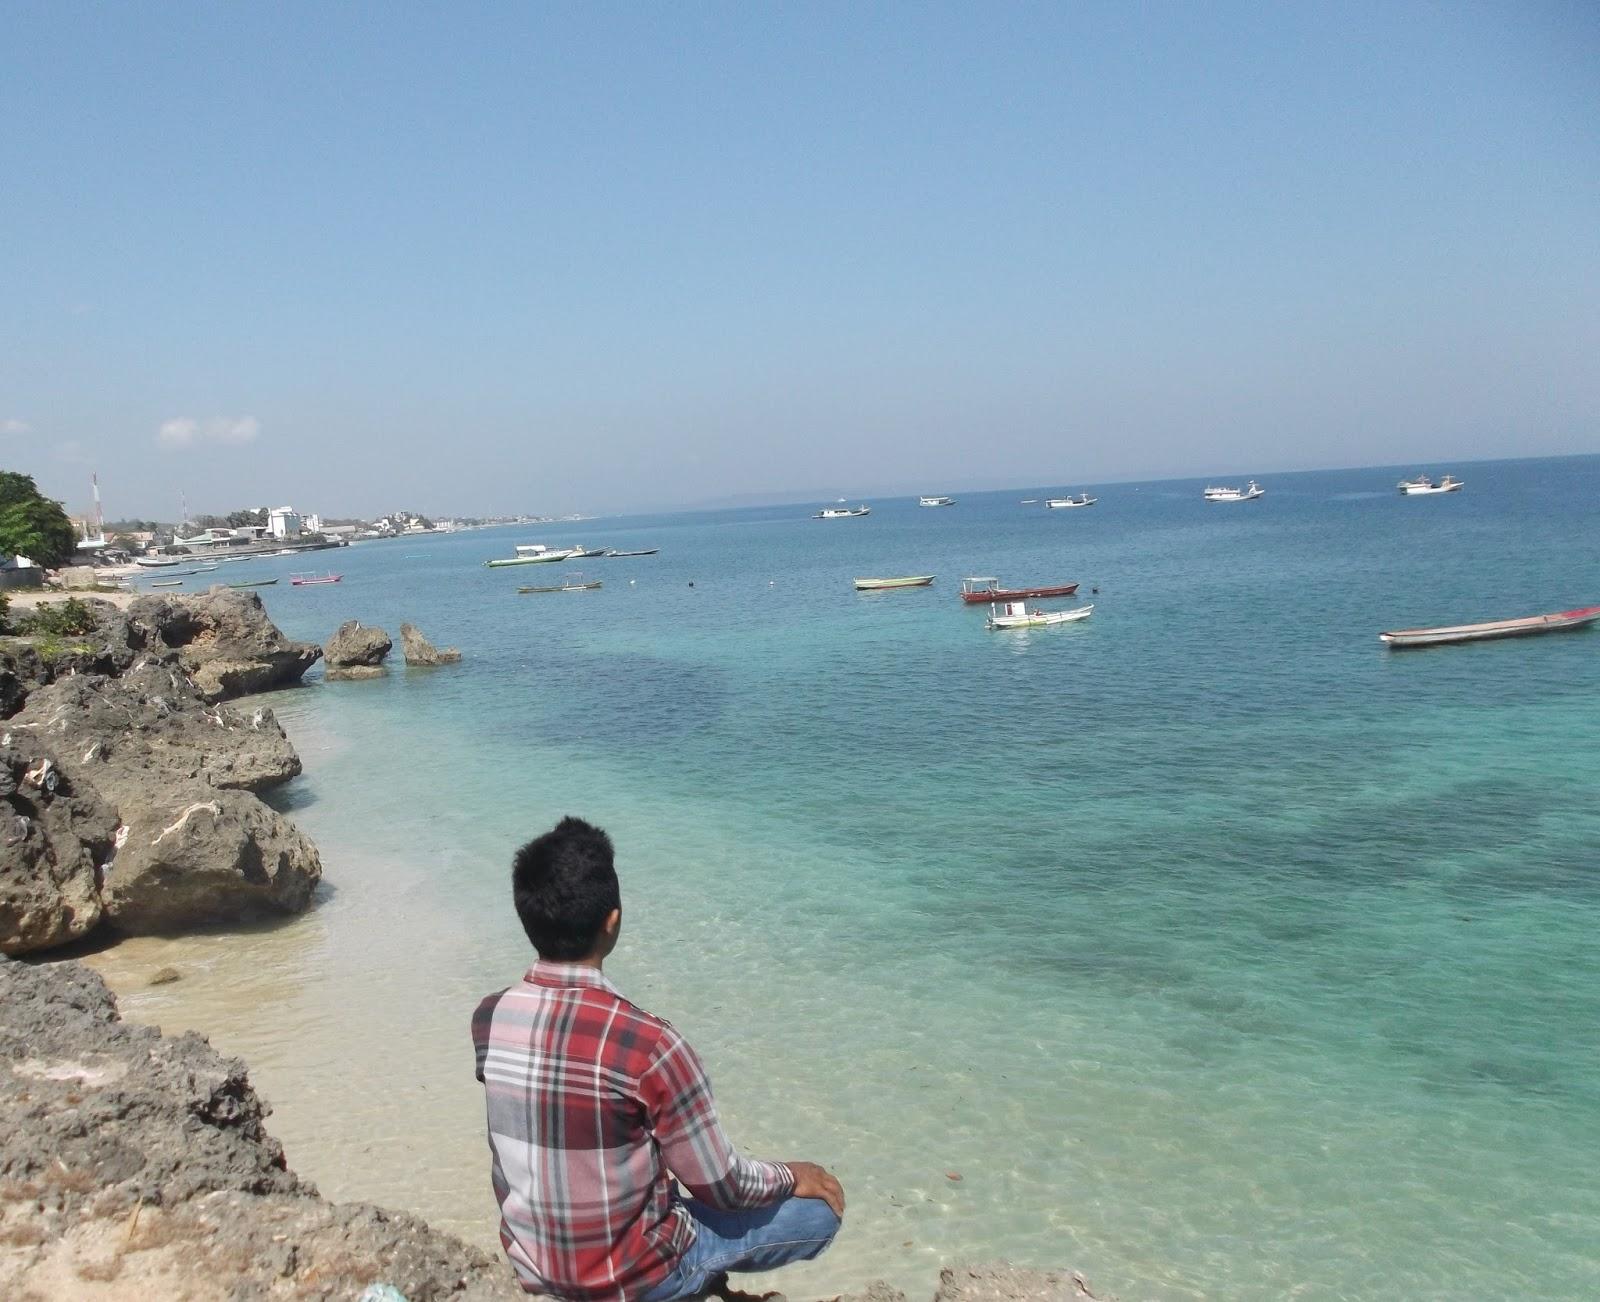 Arianto Ntt Pantai Batu Piak Kota Kupang Berjalan Kaki 2